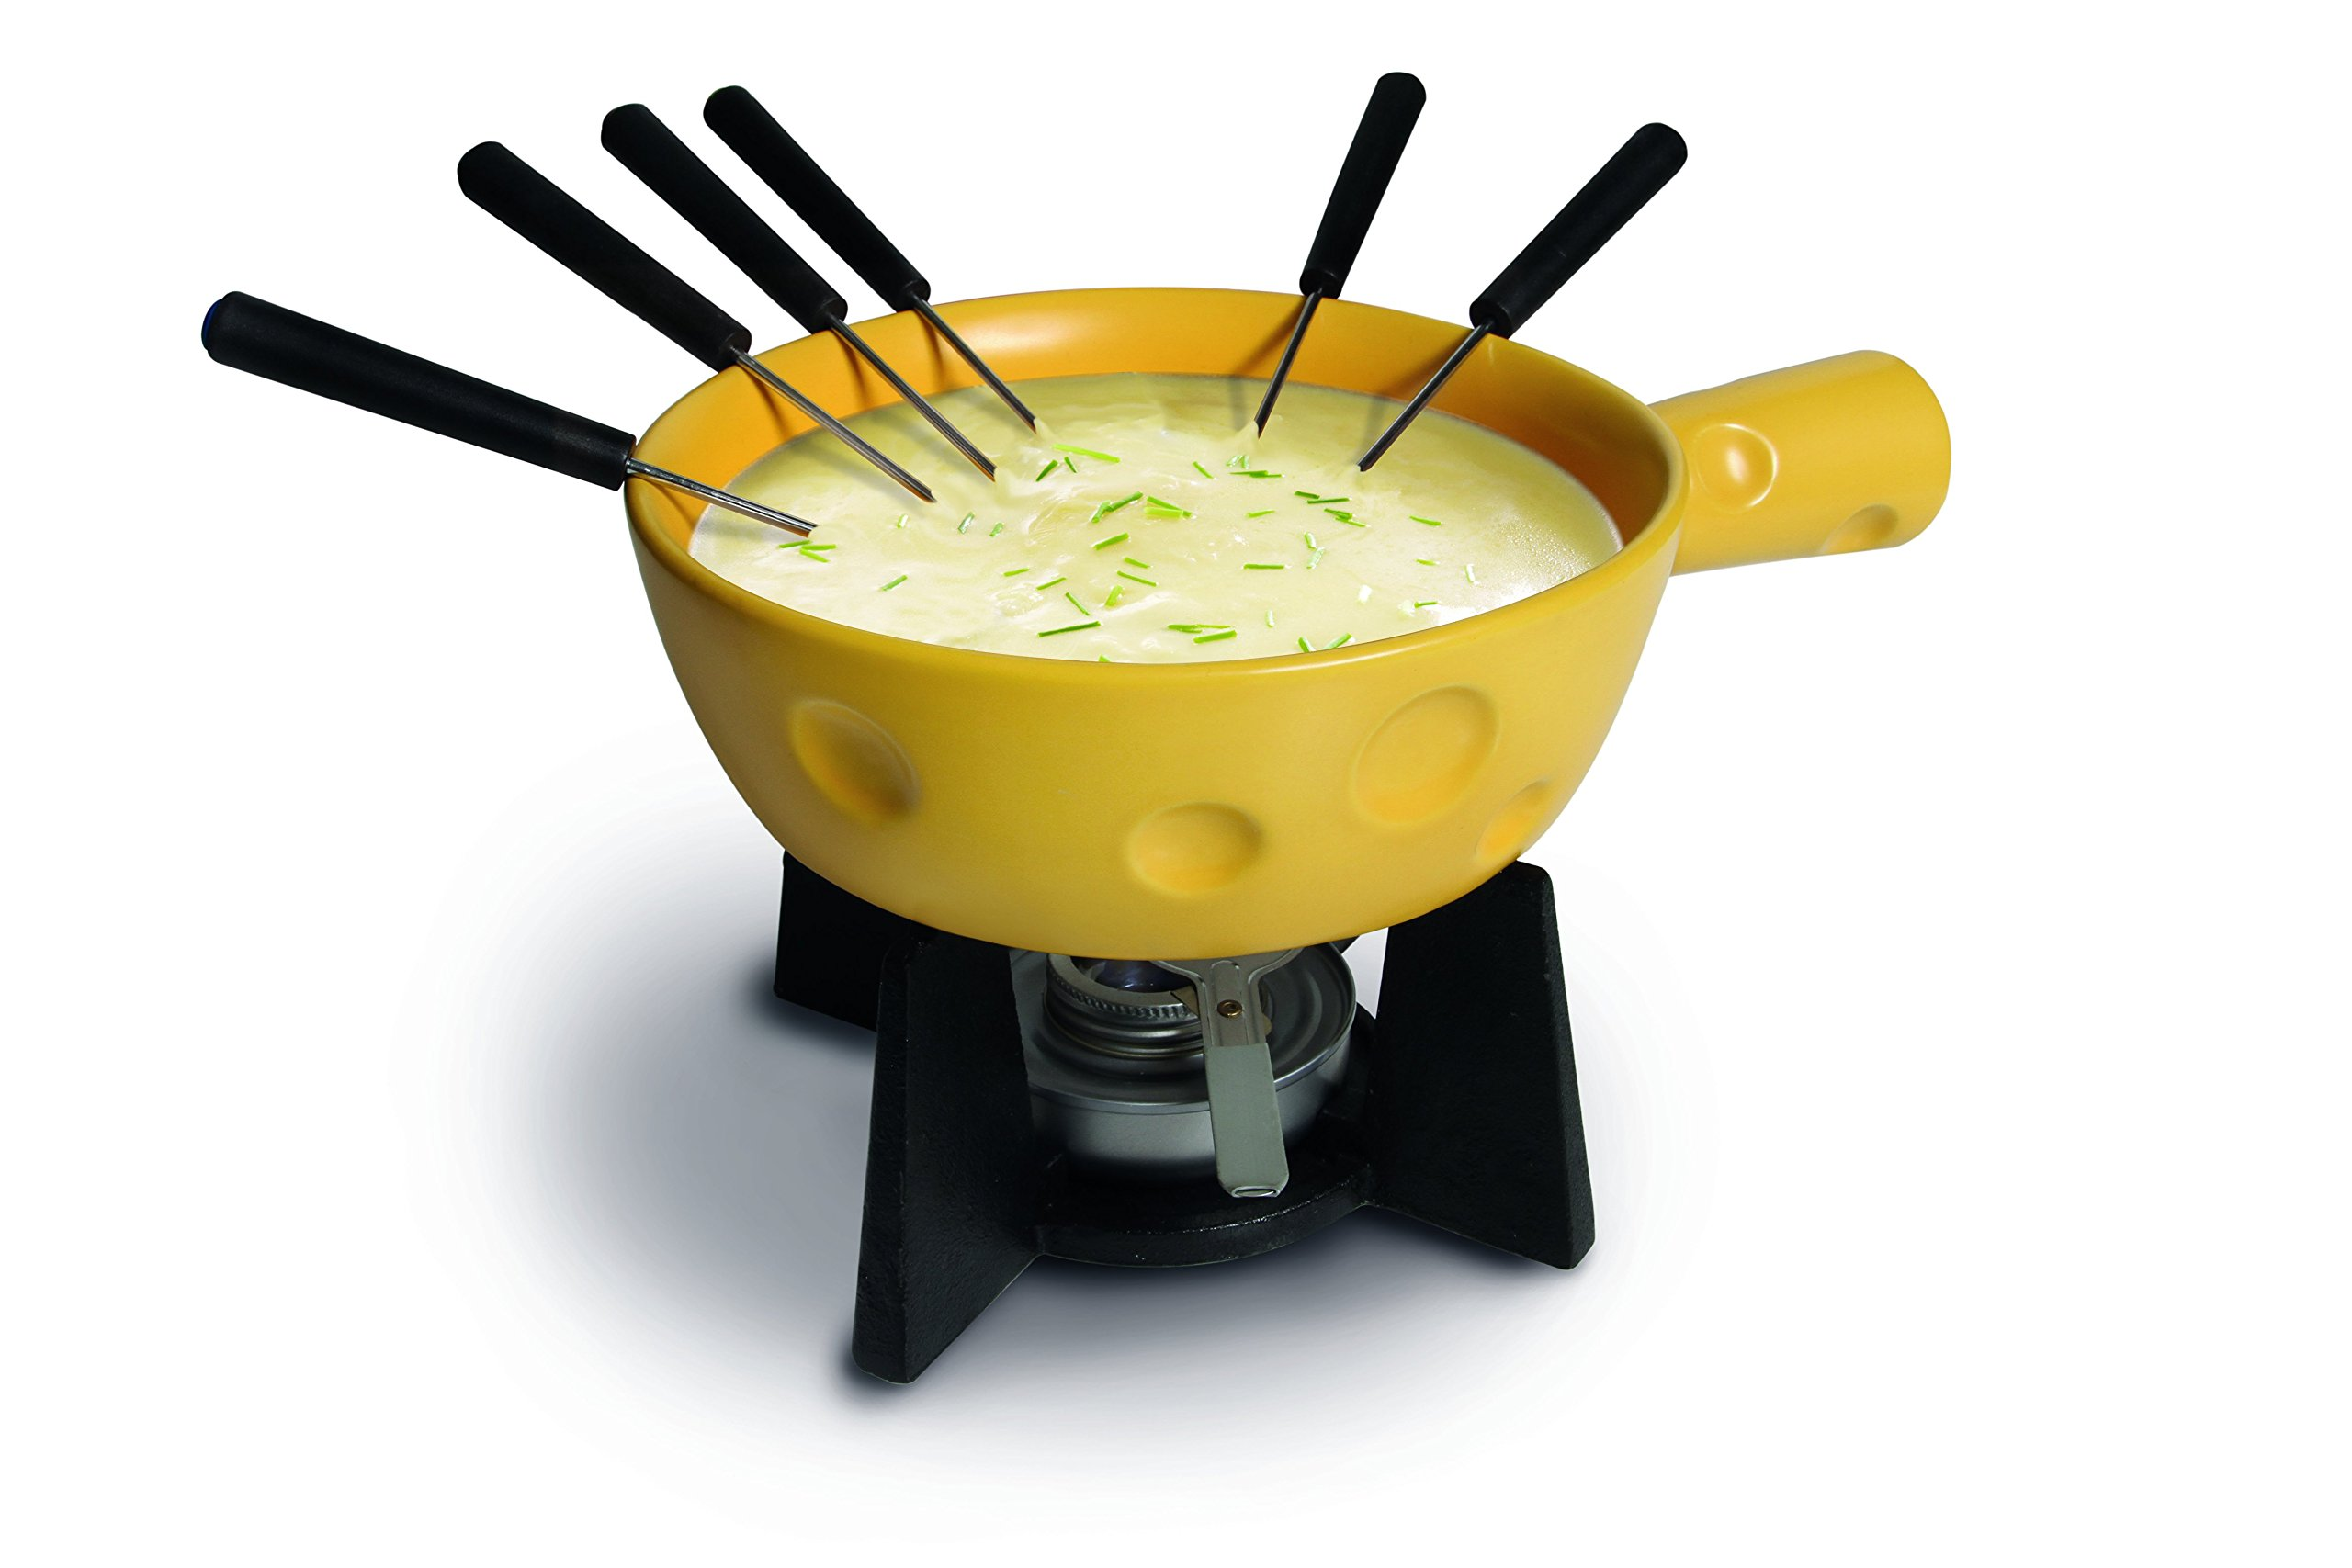 Boska Holland 853512 SuperCheesy Fondue Pot, 1 Liter, Yellow & Black by Boska Holland